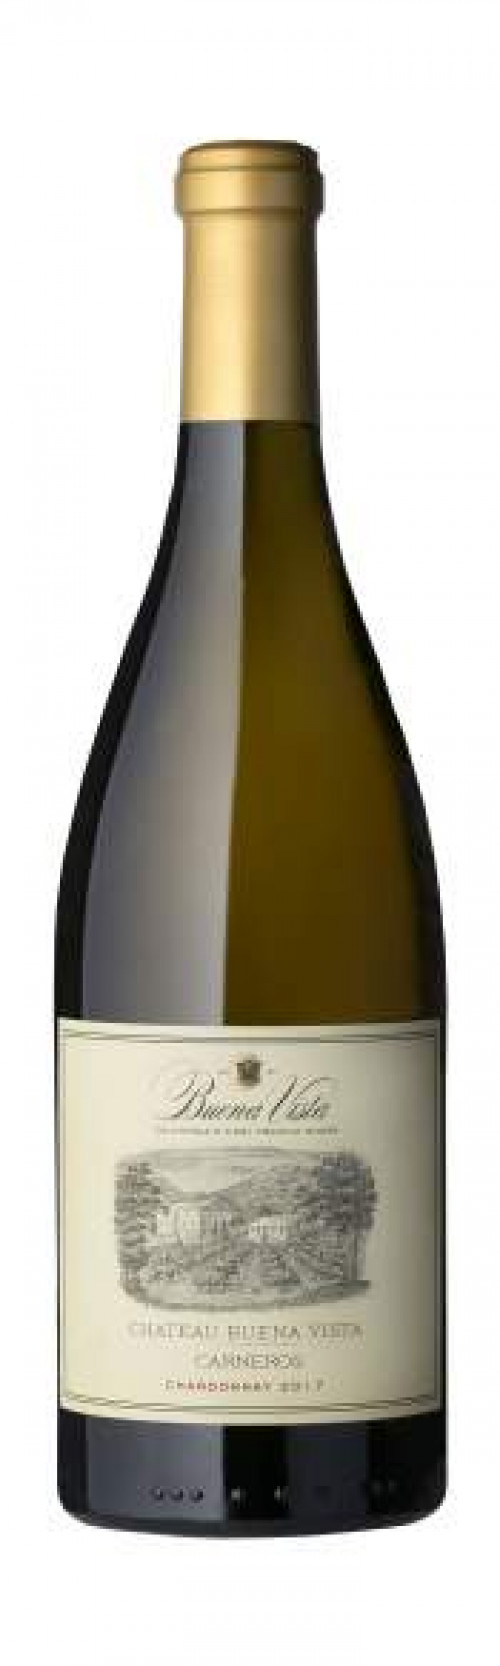 2018 Buena Vista Chateau Buena Vista Carneros Chardonnay 750ml